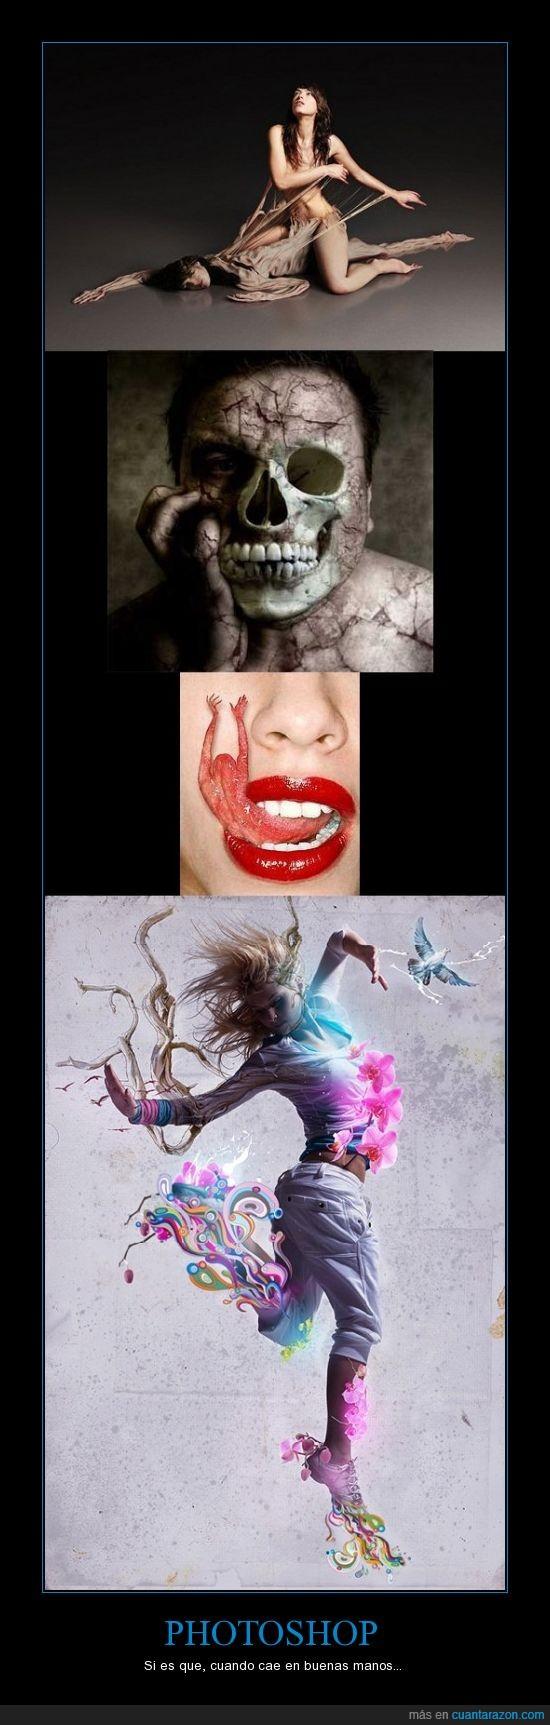 arte,calavera,cambio,chica,esqueleto,lengua,muerto,photoshop,piel,salto